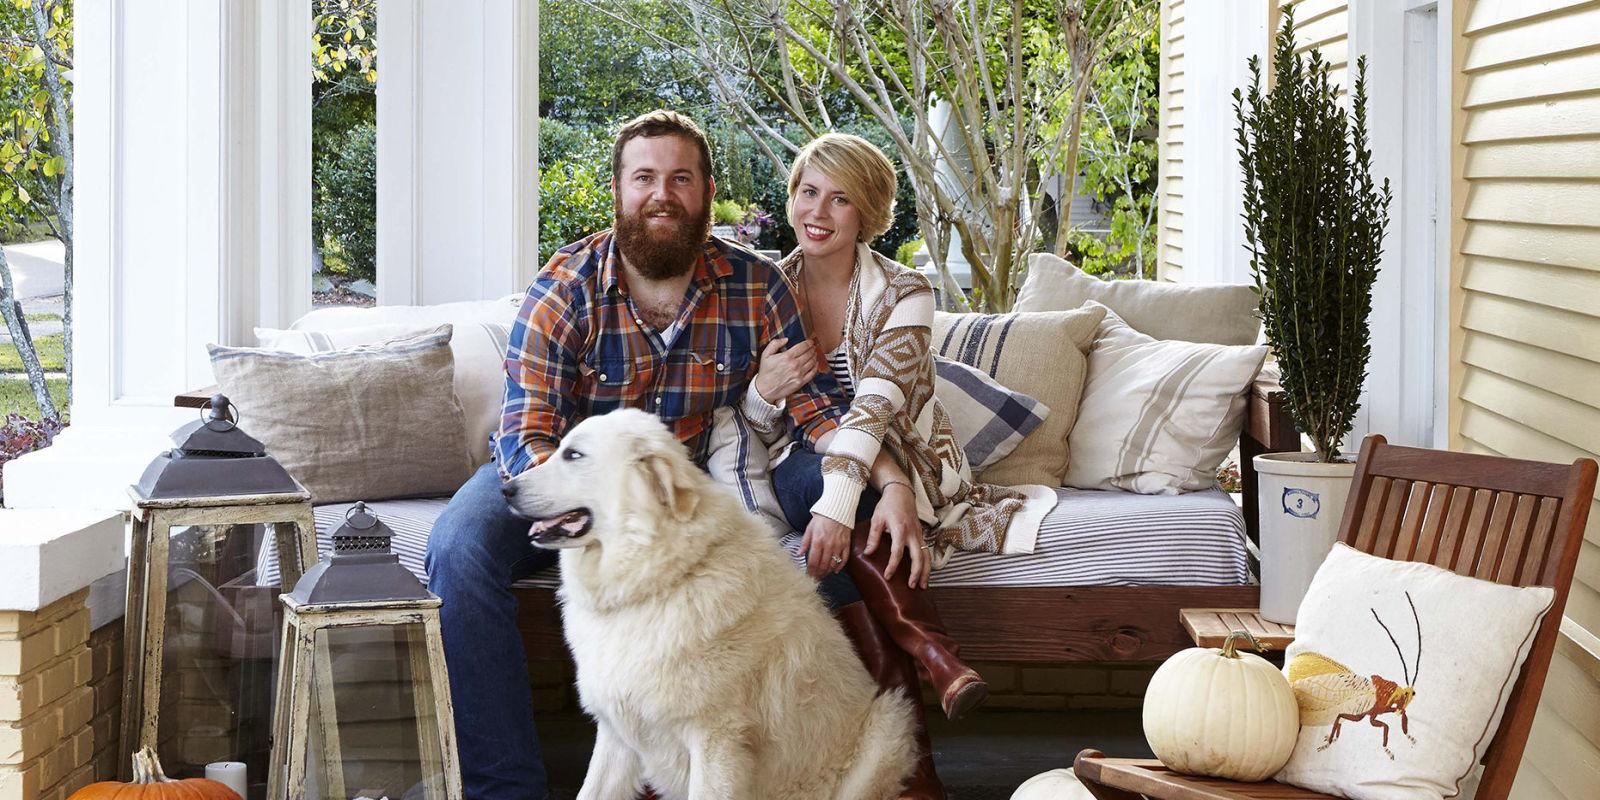 Erin And Ben Napier Hosts Of Hgtv Home Town